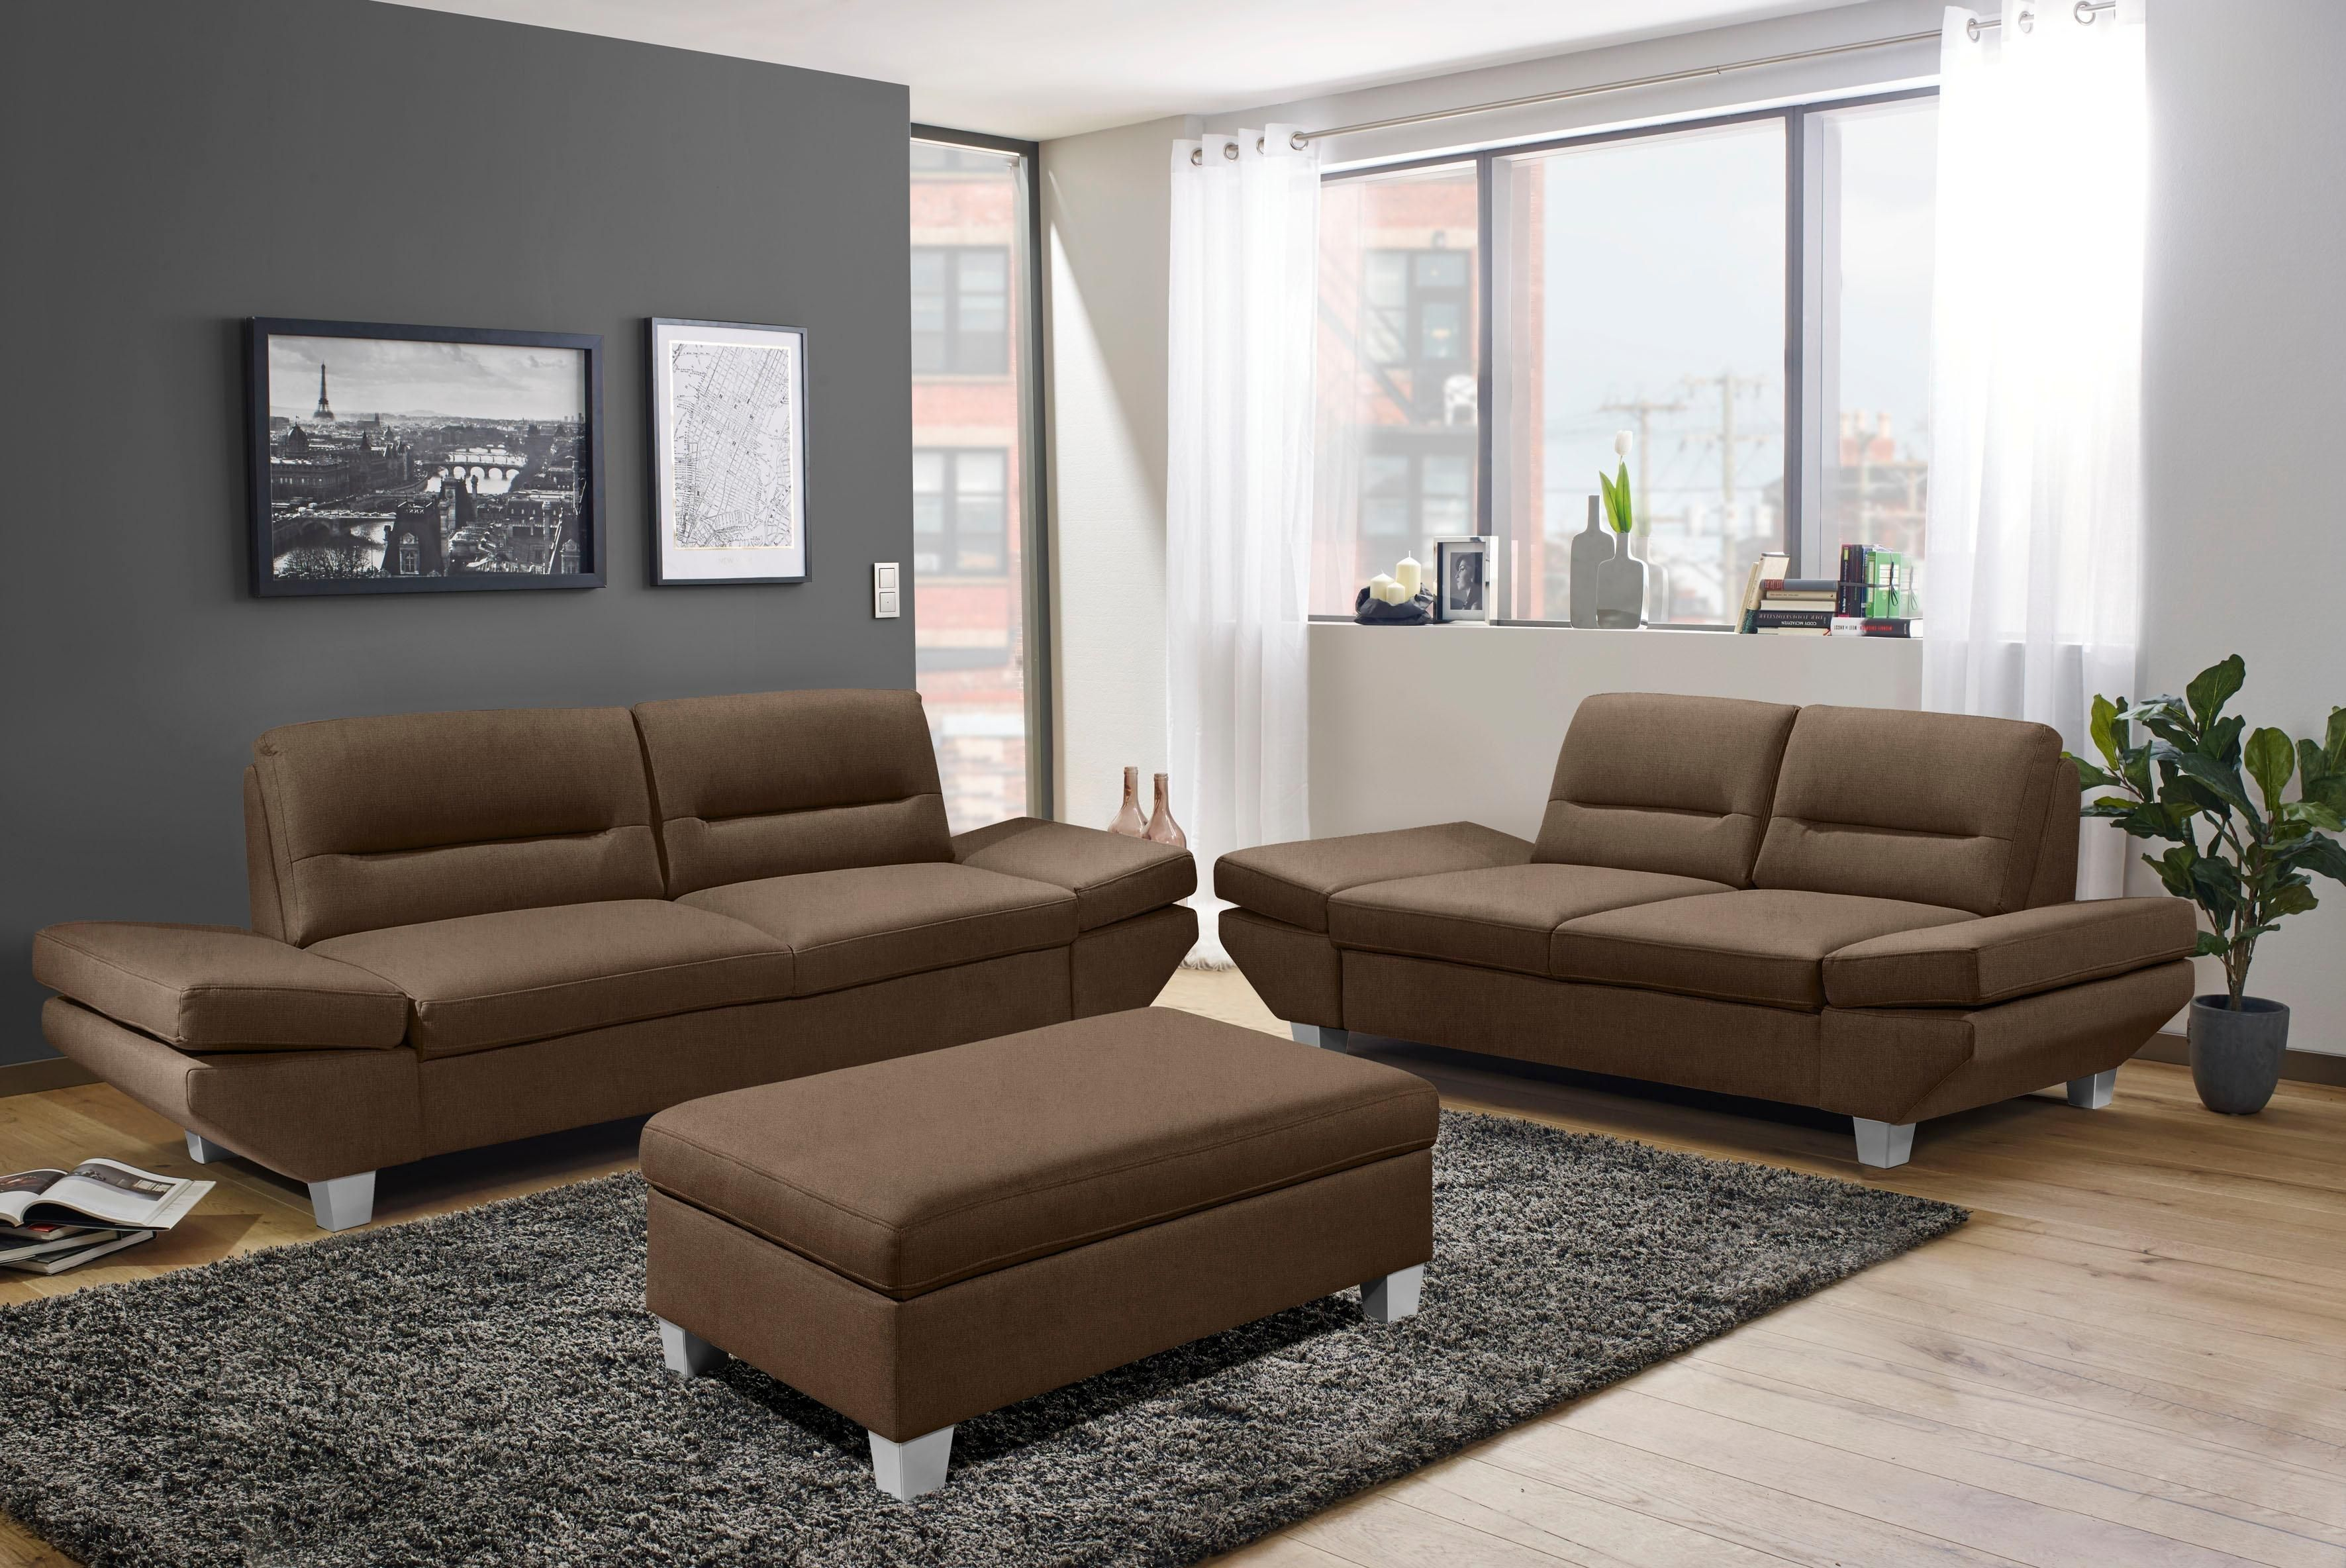 Ecksofa Hudson V Leder Sofa Cushions Online Shopping Ektorp Sofa Ecksofa Hudson V Sofa Set Online Shopping Below 10000 Kissen Sofa Wohnen Sitzgruppe